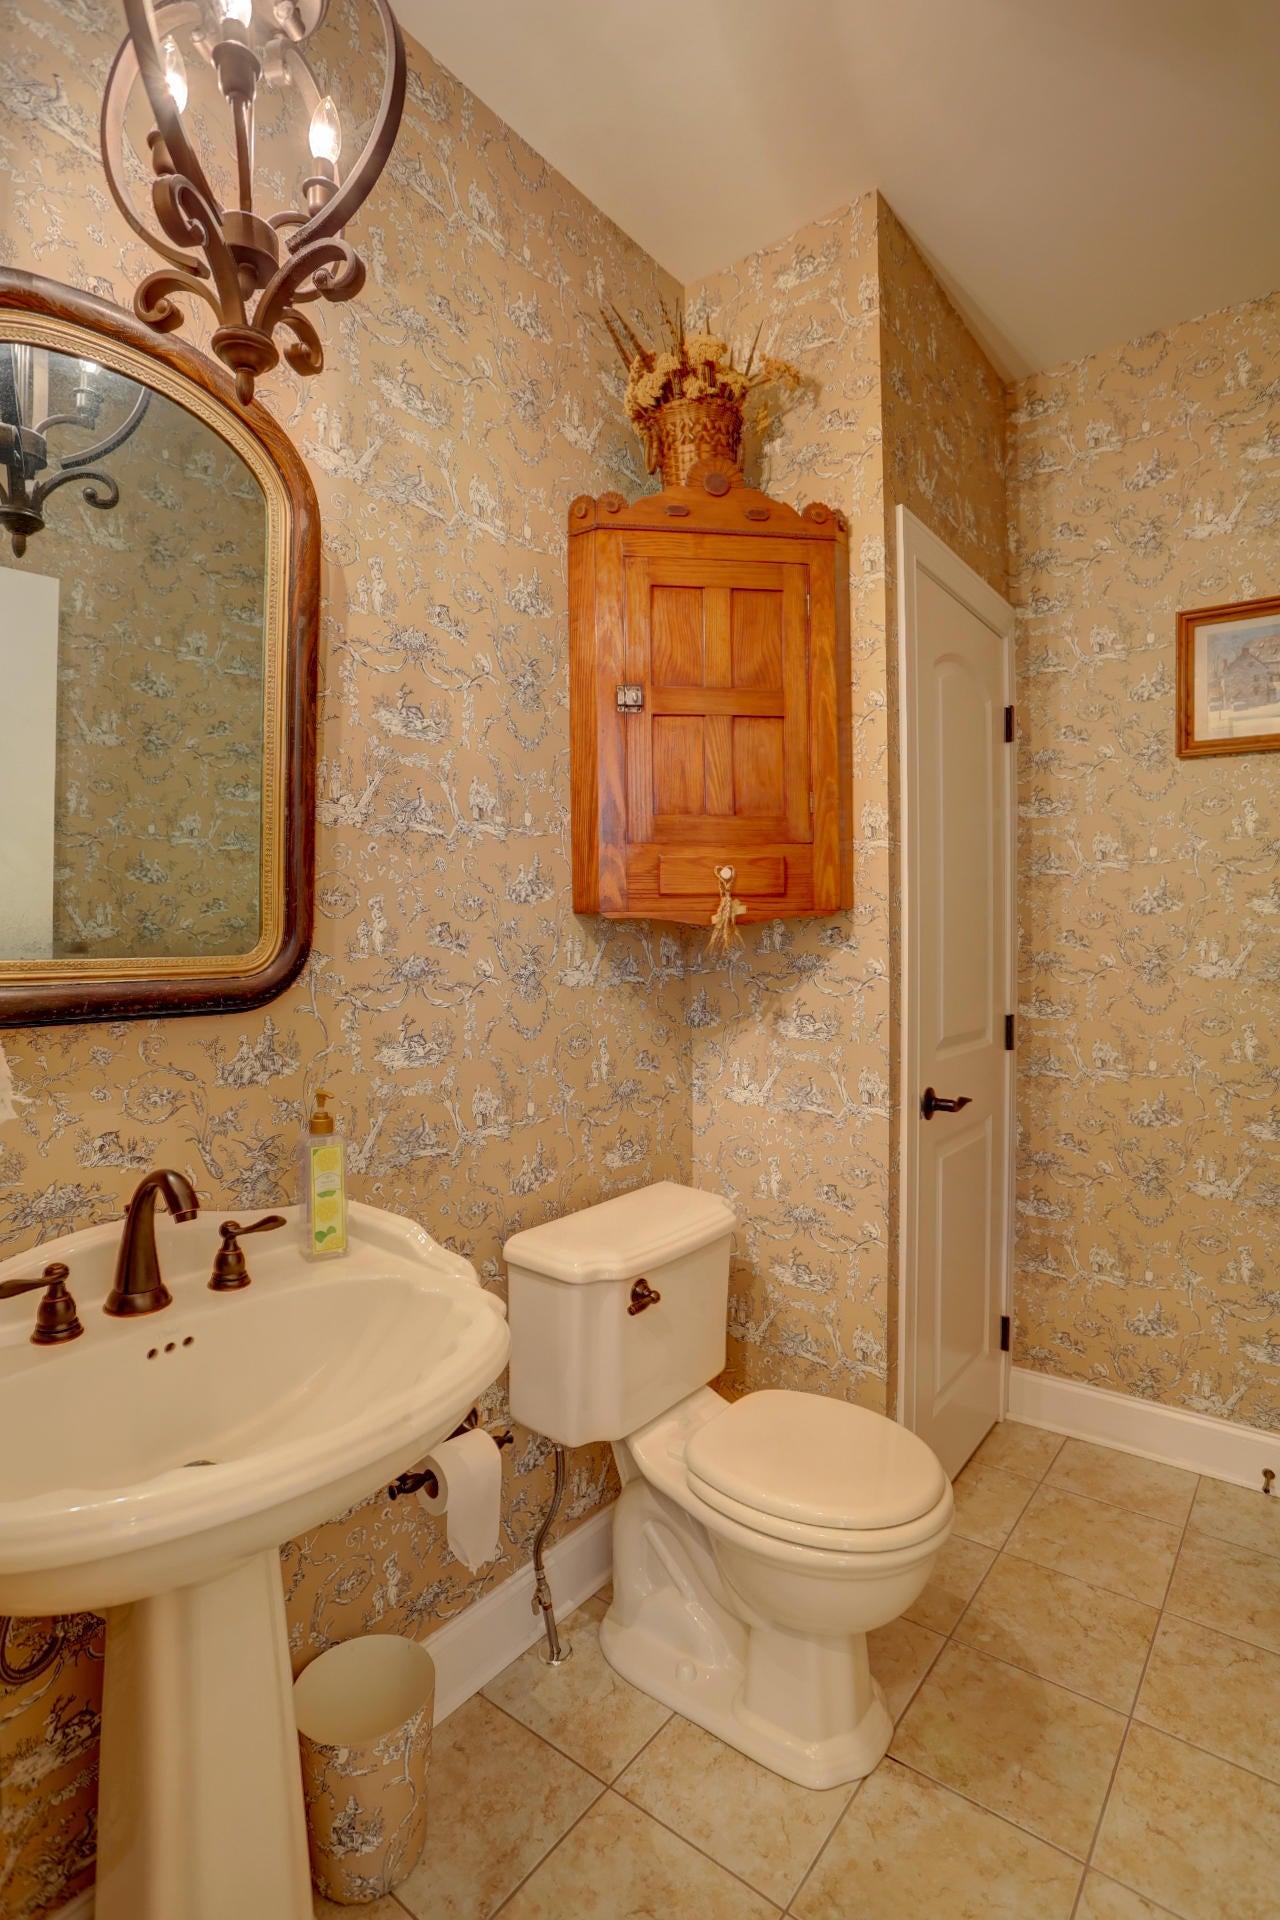 Additional photo for property listing at 42 BUCK RUN ROAD 42 BUCK RUN ROAD Conestoga, Pennsylvania 17516 Estados Unidos